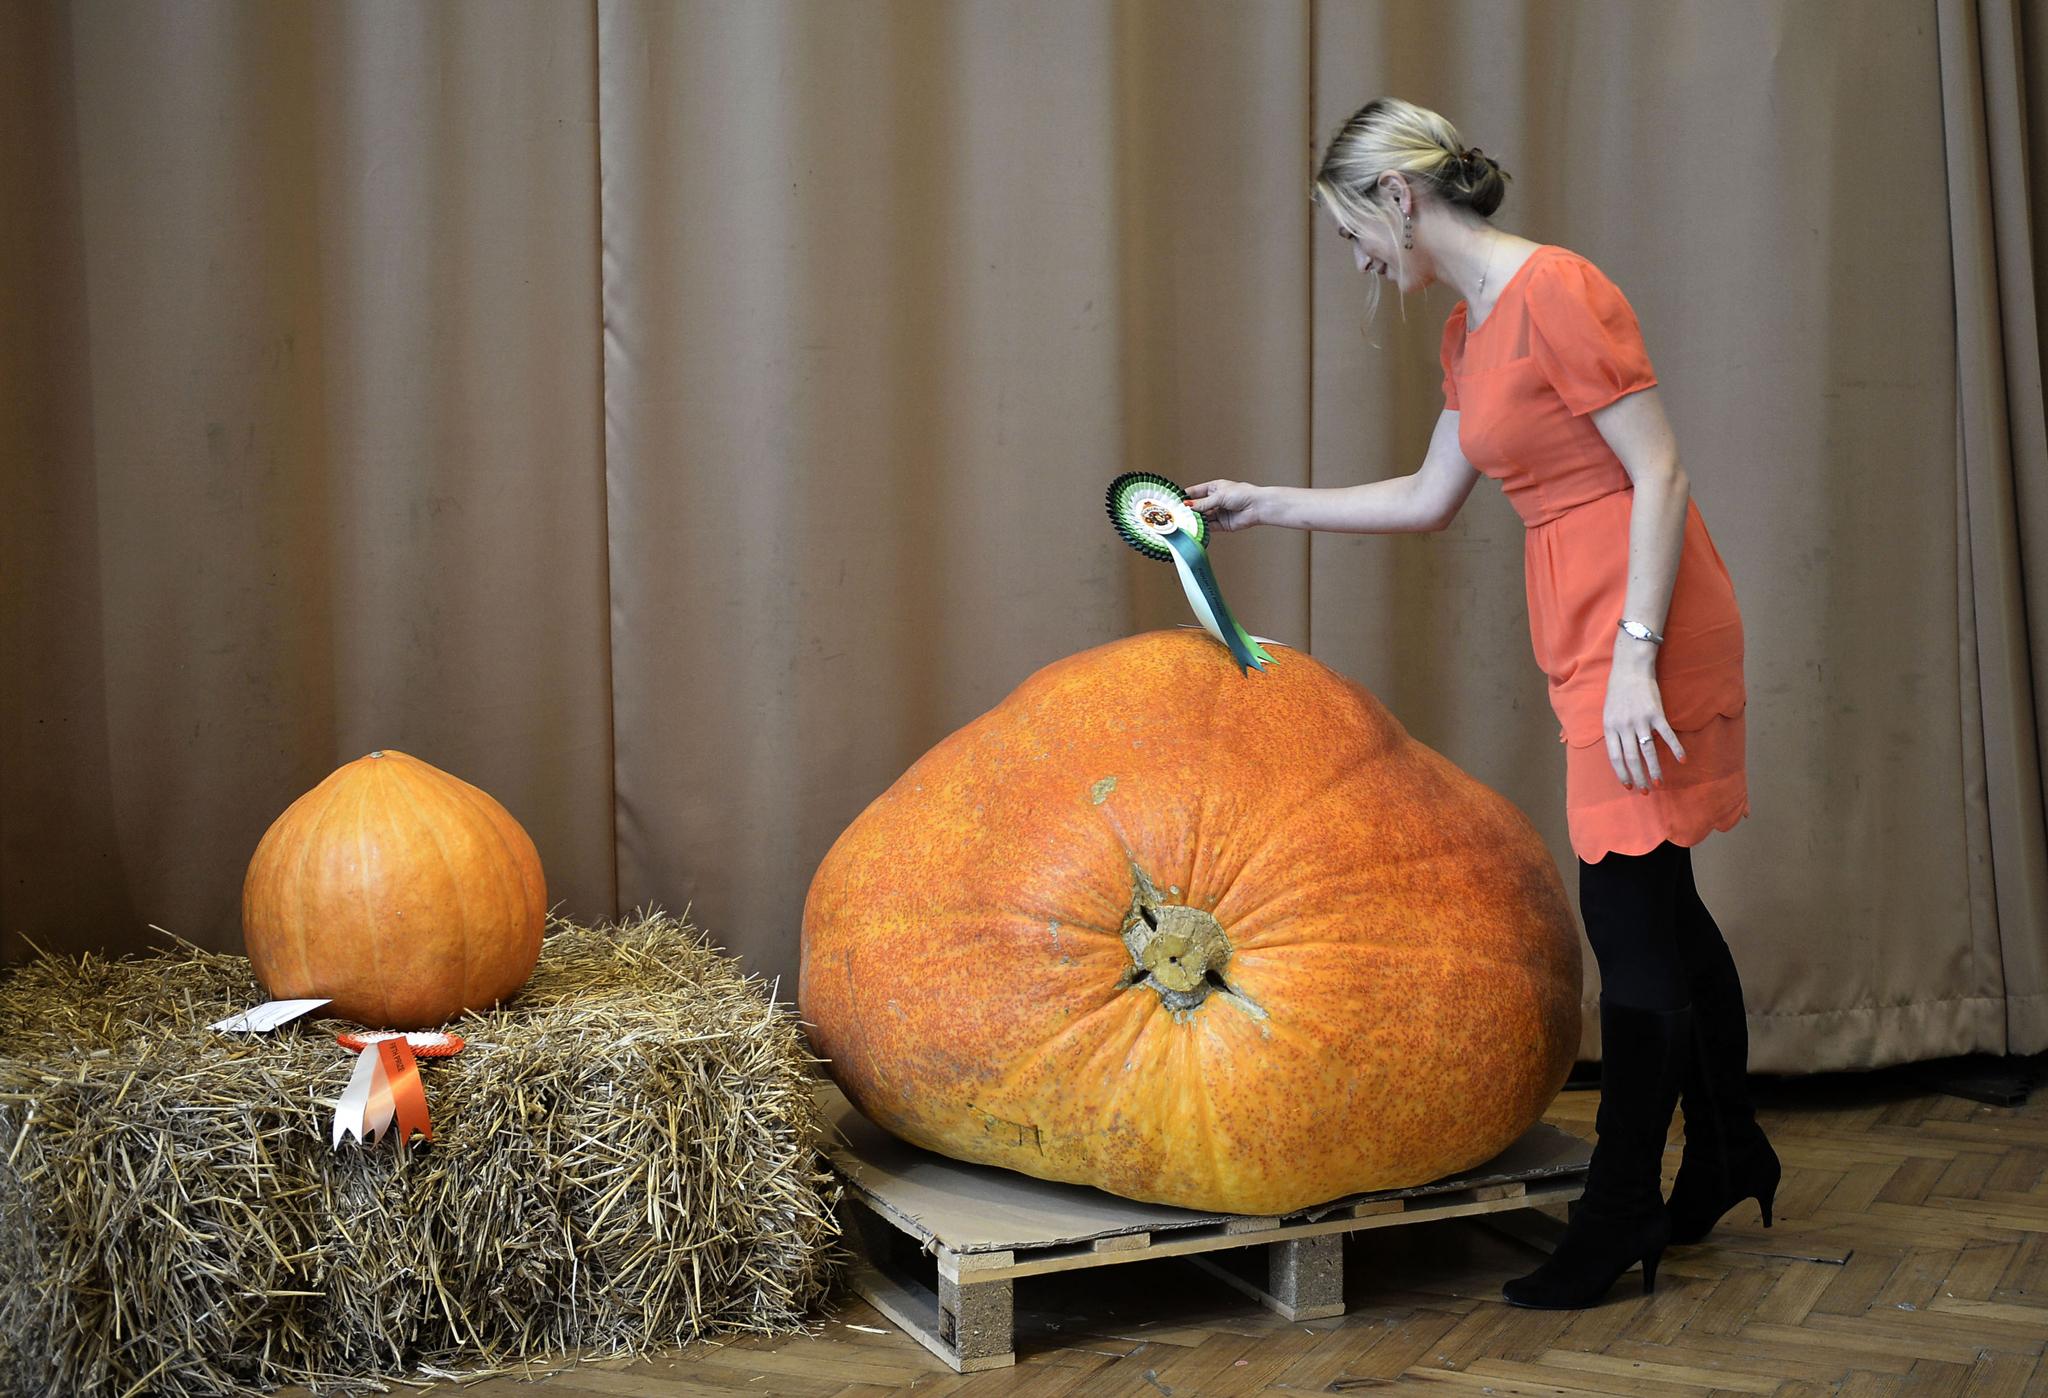 Biggest Punpkin Competition at London Harvest Festival Show